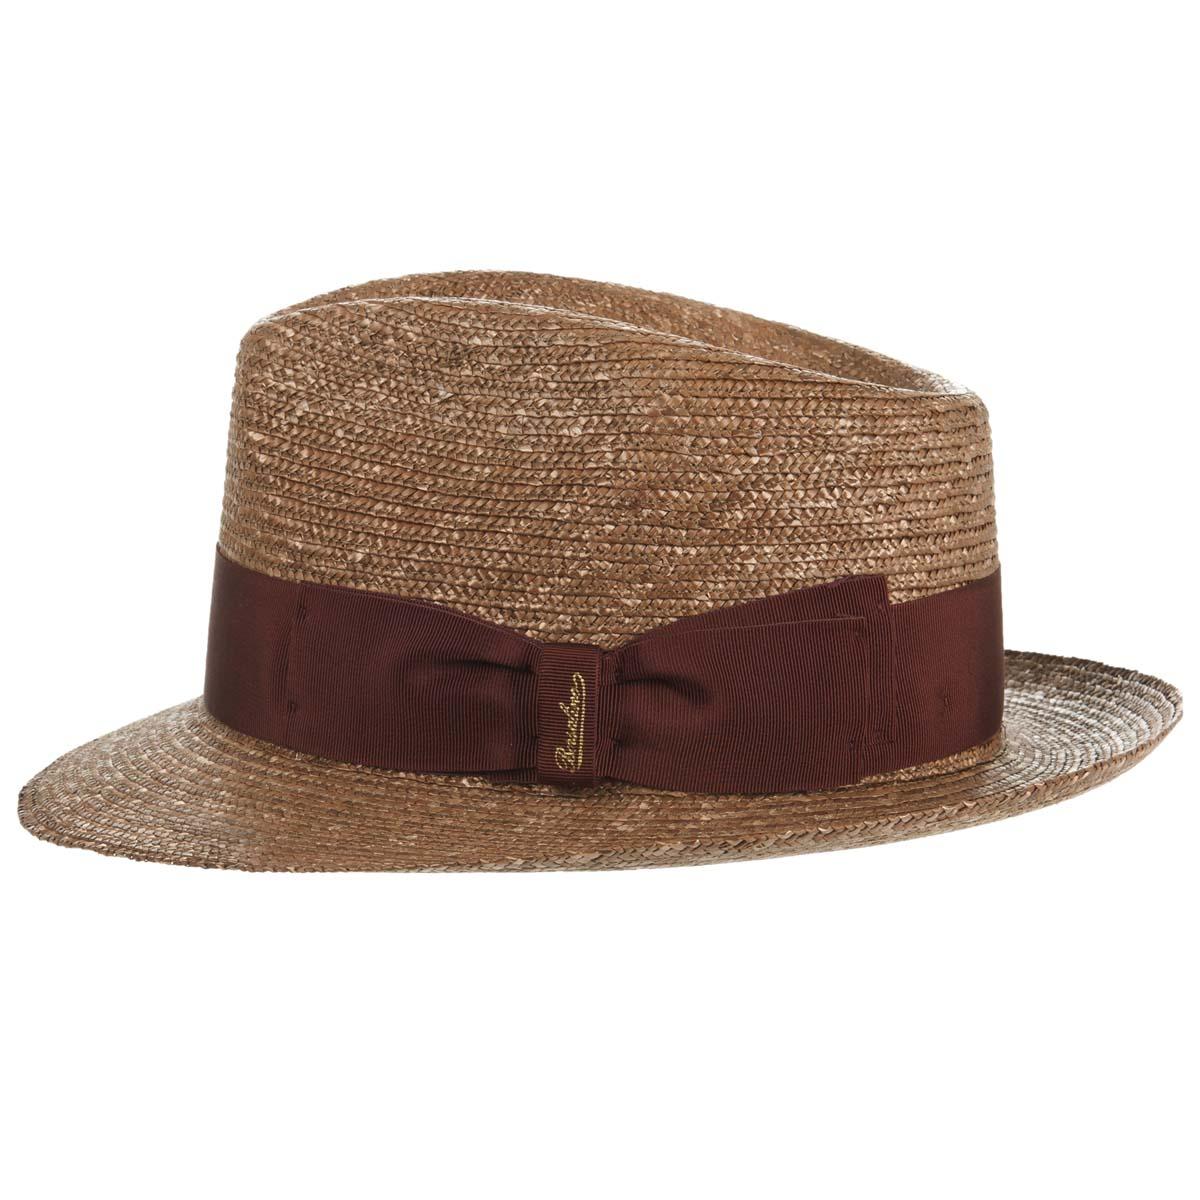 Cappello BORSALINO a tesa piccola Cappello BORSALINO a tesa piccola ... 128f7d1a57c3